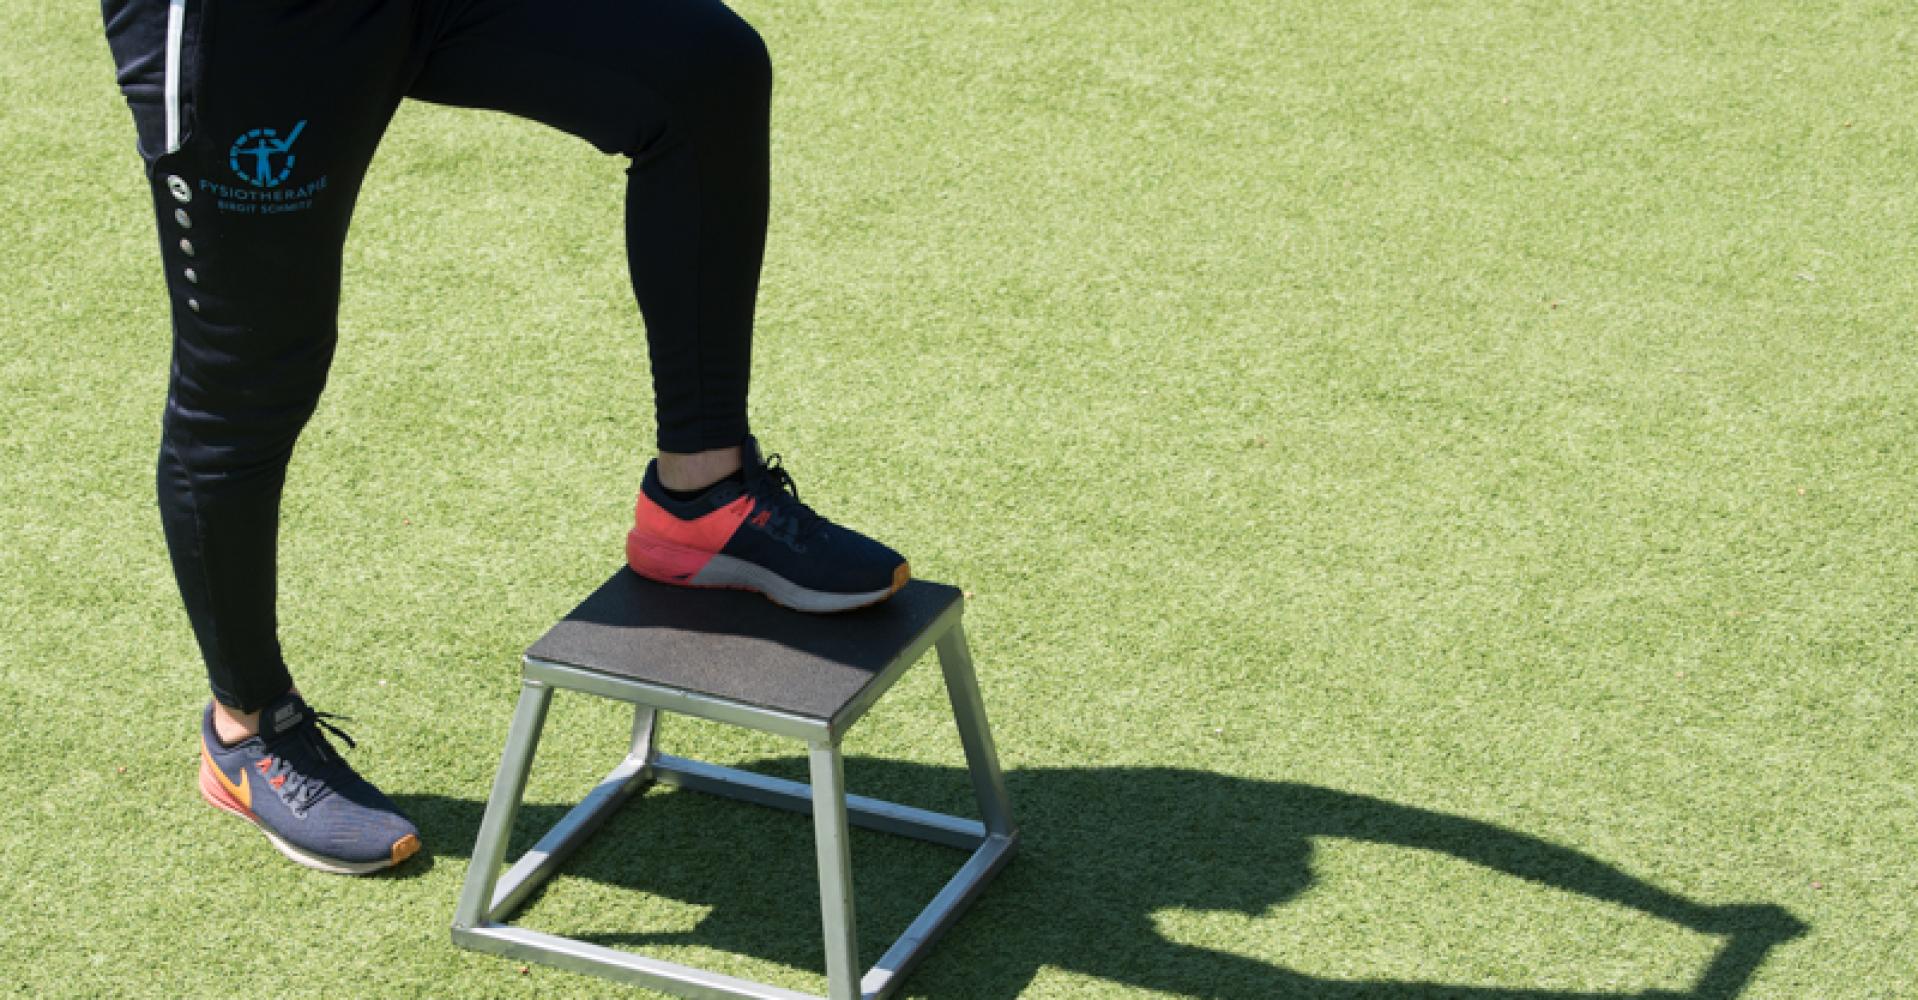 bs-fysiotherapie-2020